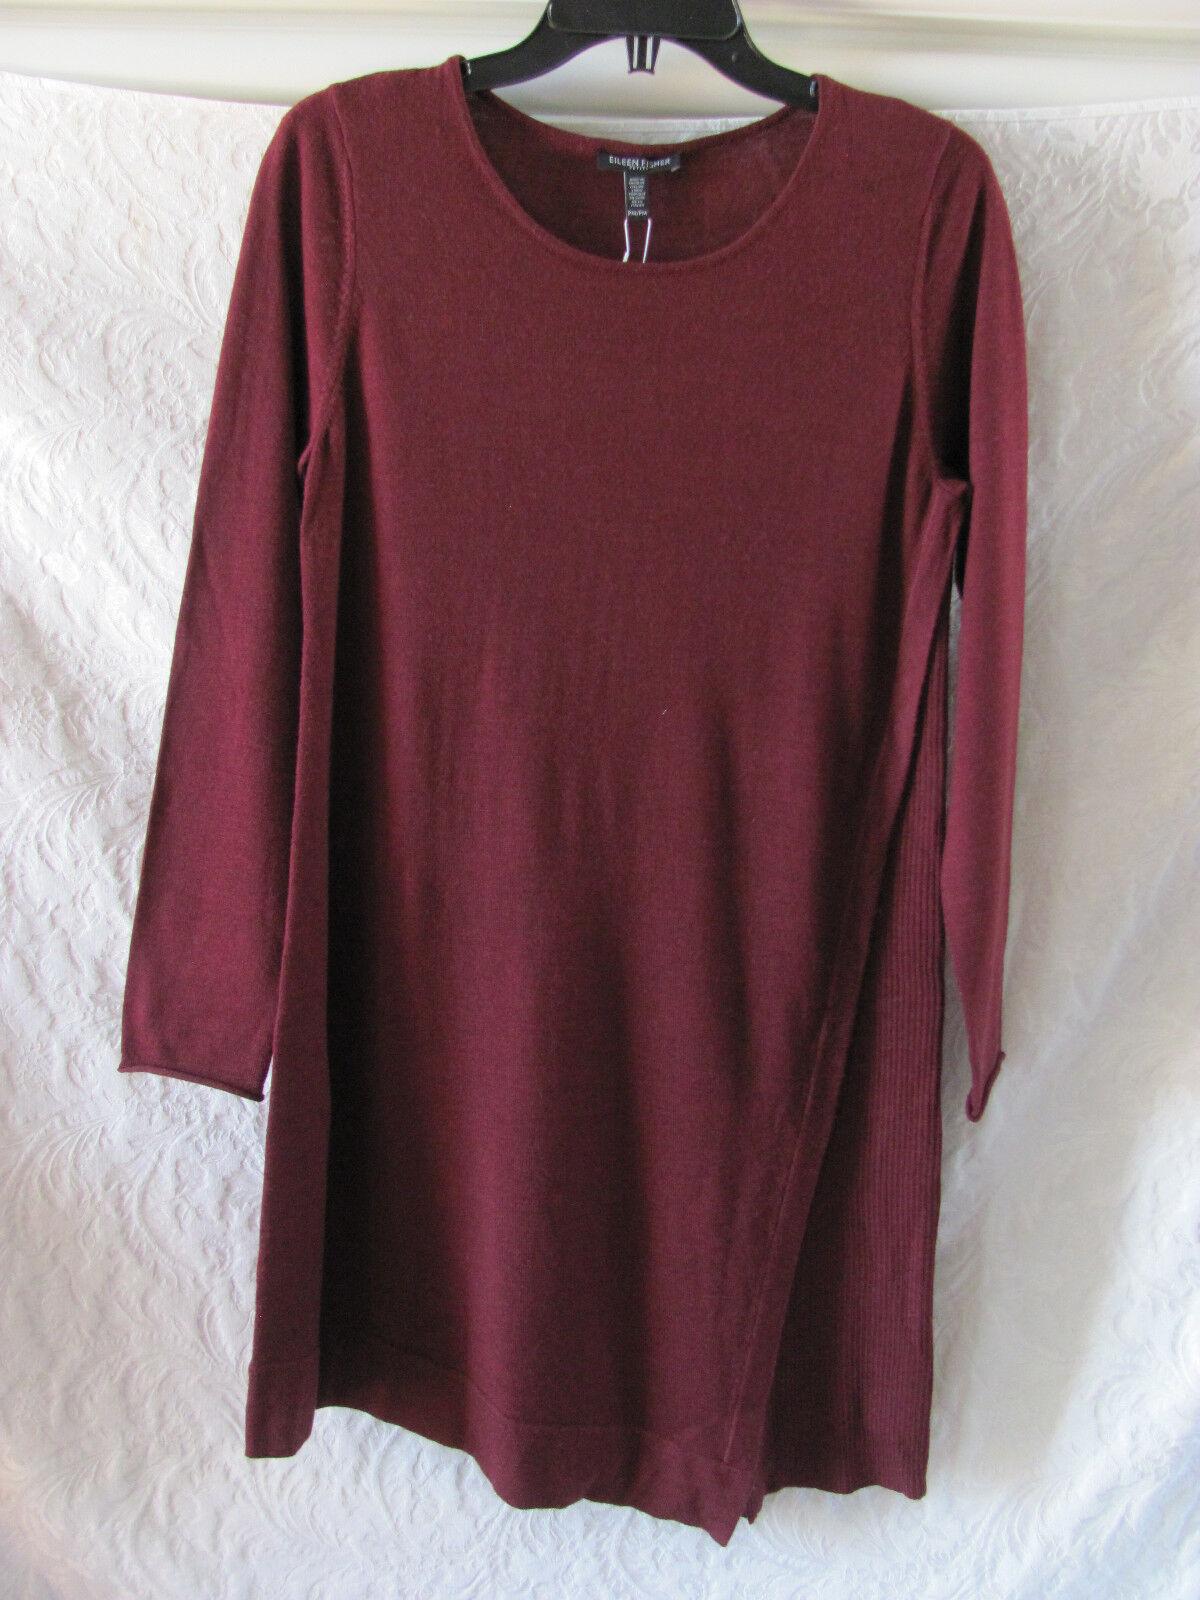 Eileen Fisher Asym Hem Sweater Dress-Merino Wool-Passion Wool-Passion Wool-Passion Flower-Size PM-NWT  278 8cf1f9